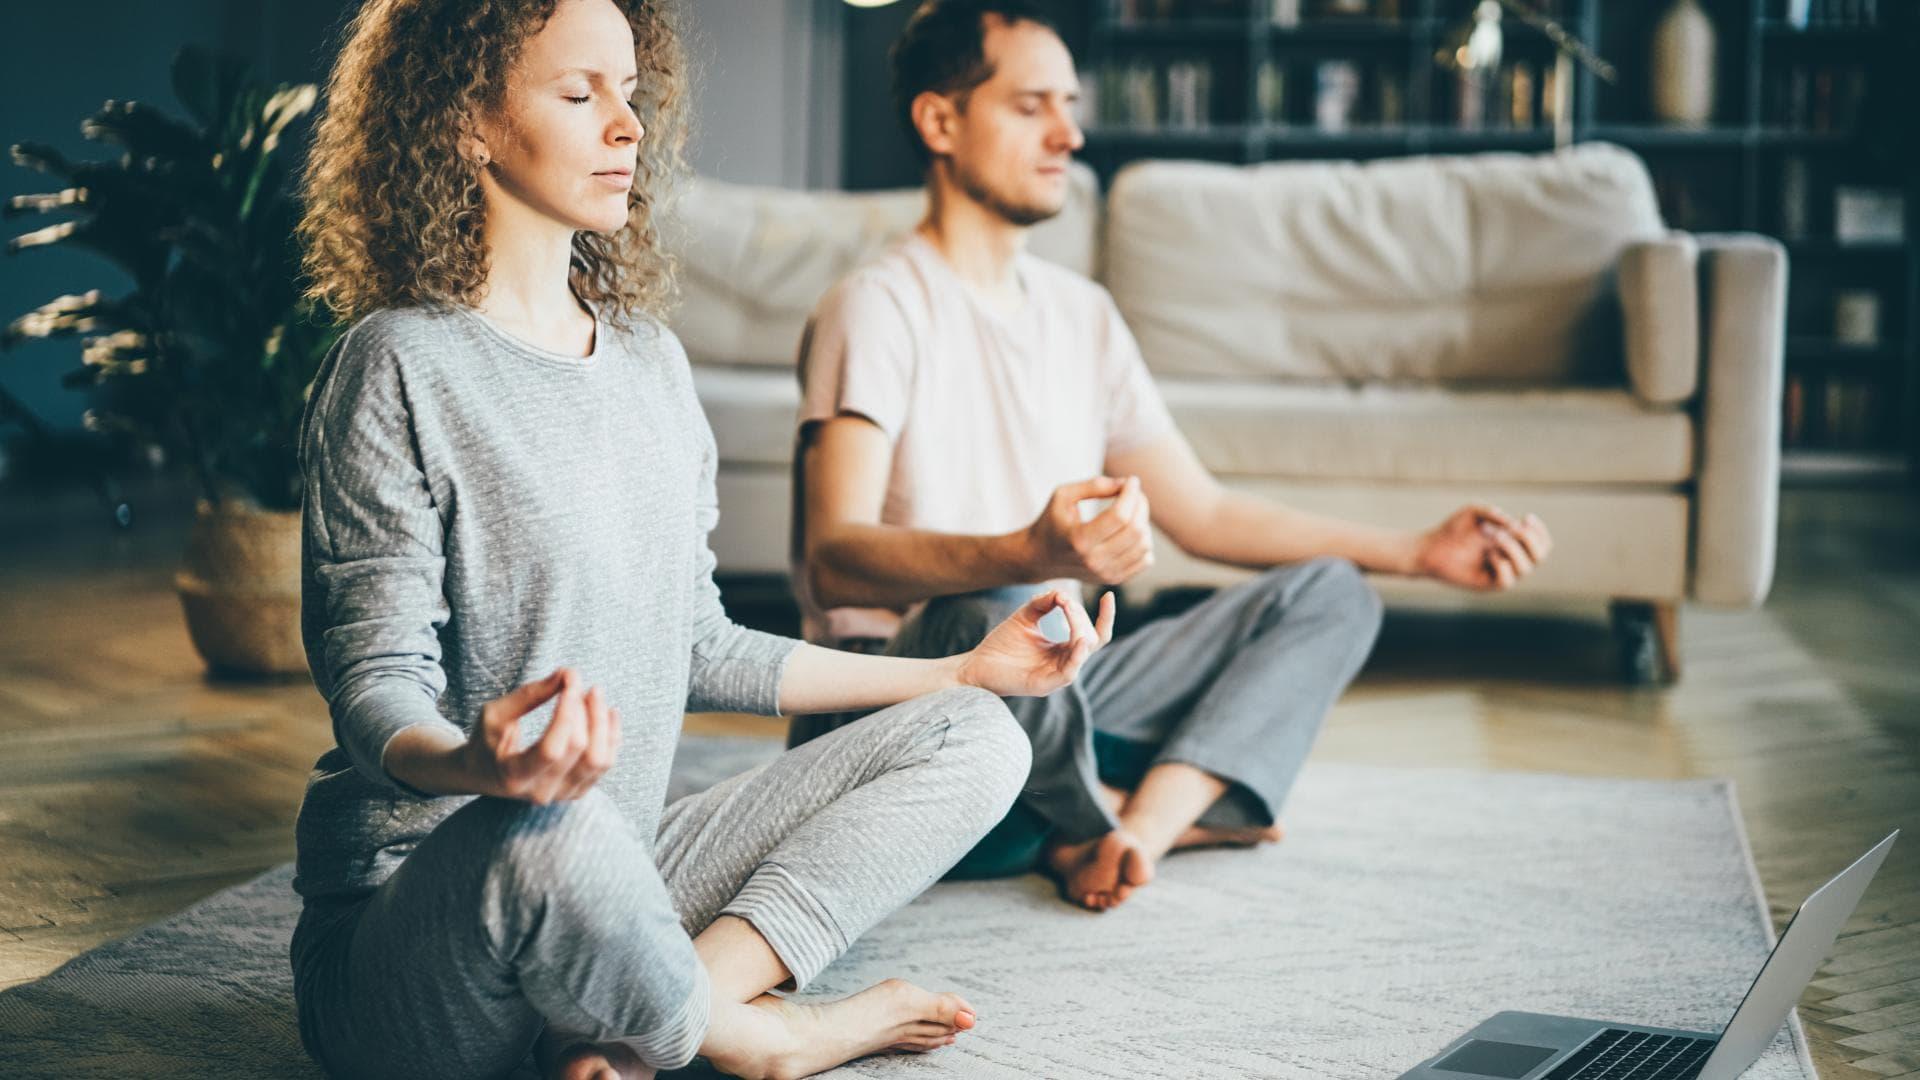 yoga pärchen schneidersitz meditation mann frau